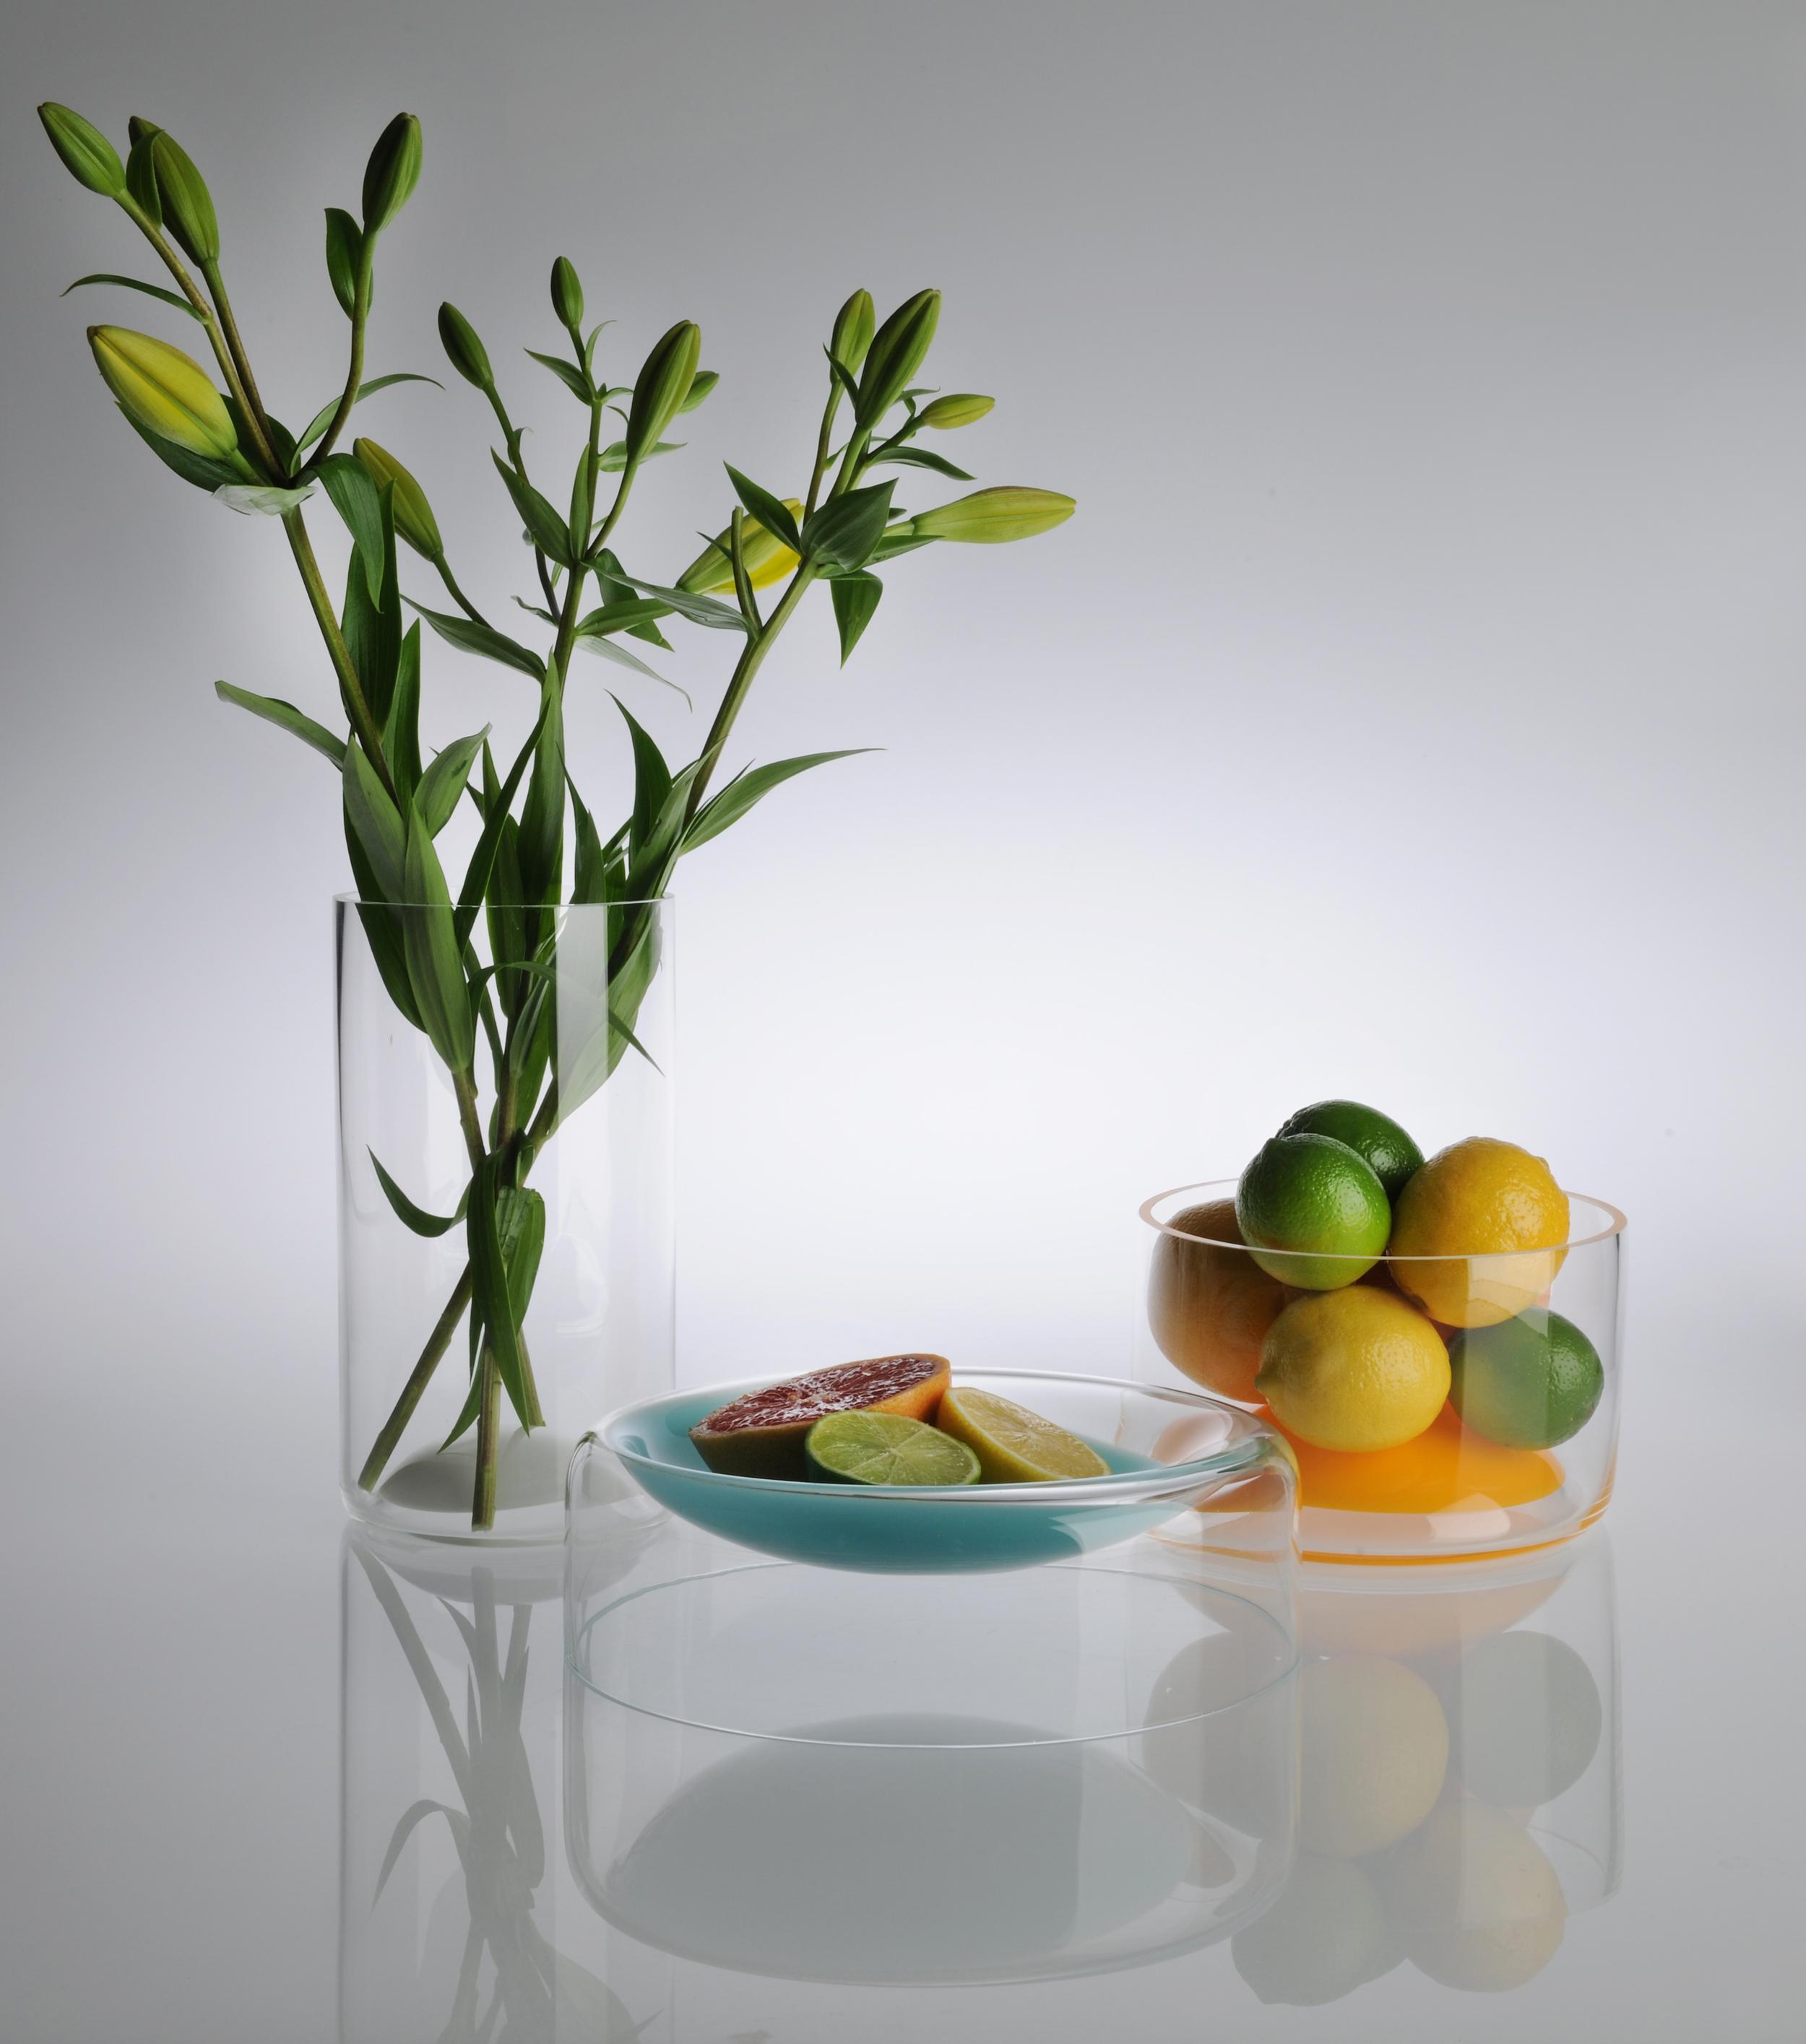 White Suspension Vase (RRP:$242.00), Blue Suspension Bowl (RRP:342.00) and Orange Medium Suspension Bowl (RRP: 242.00)